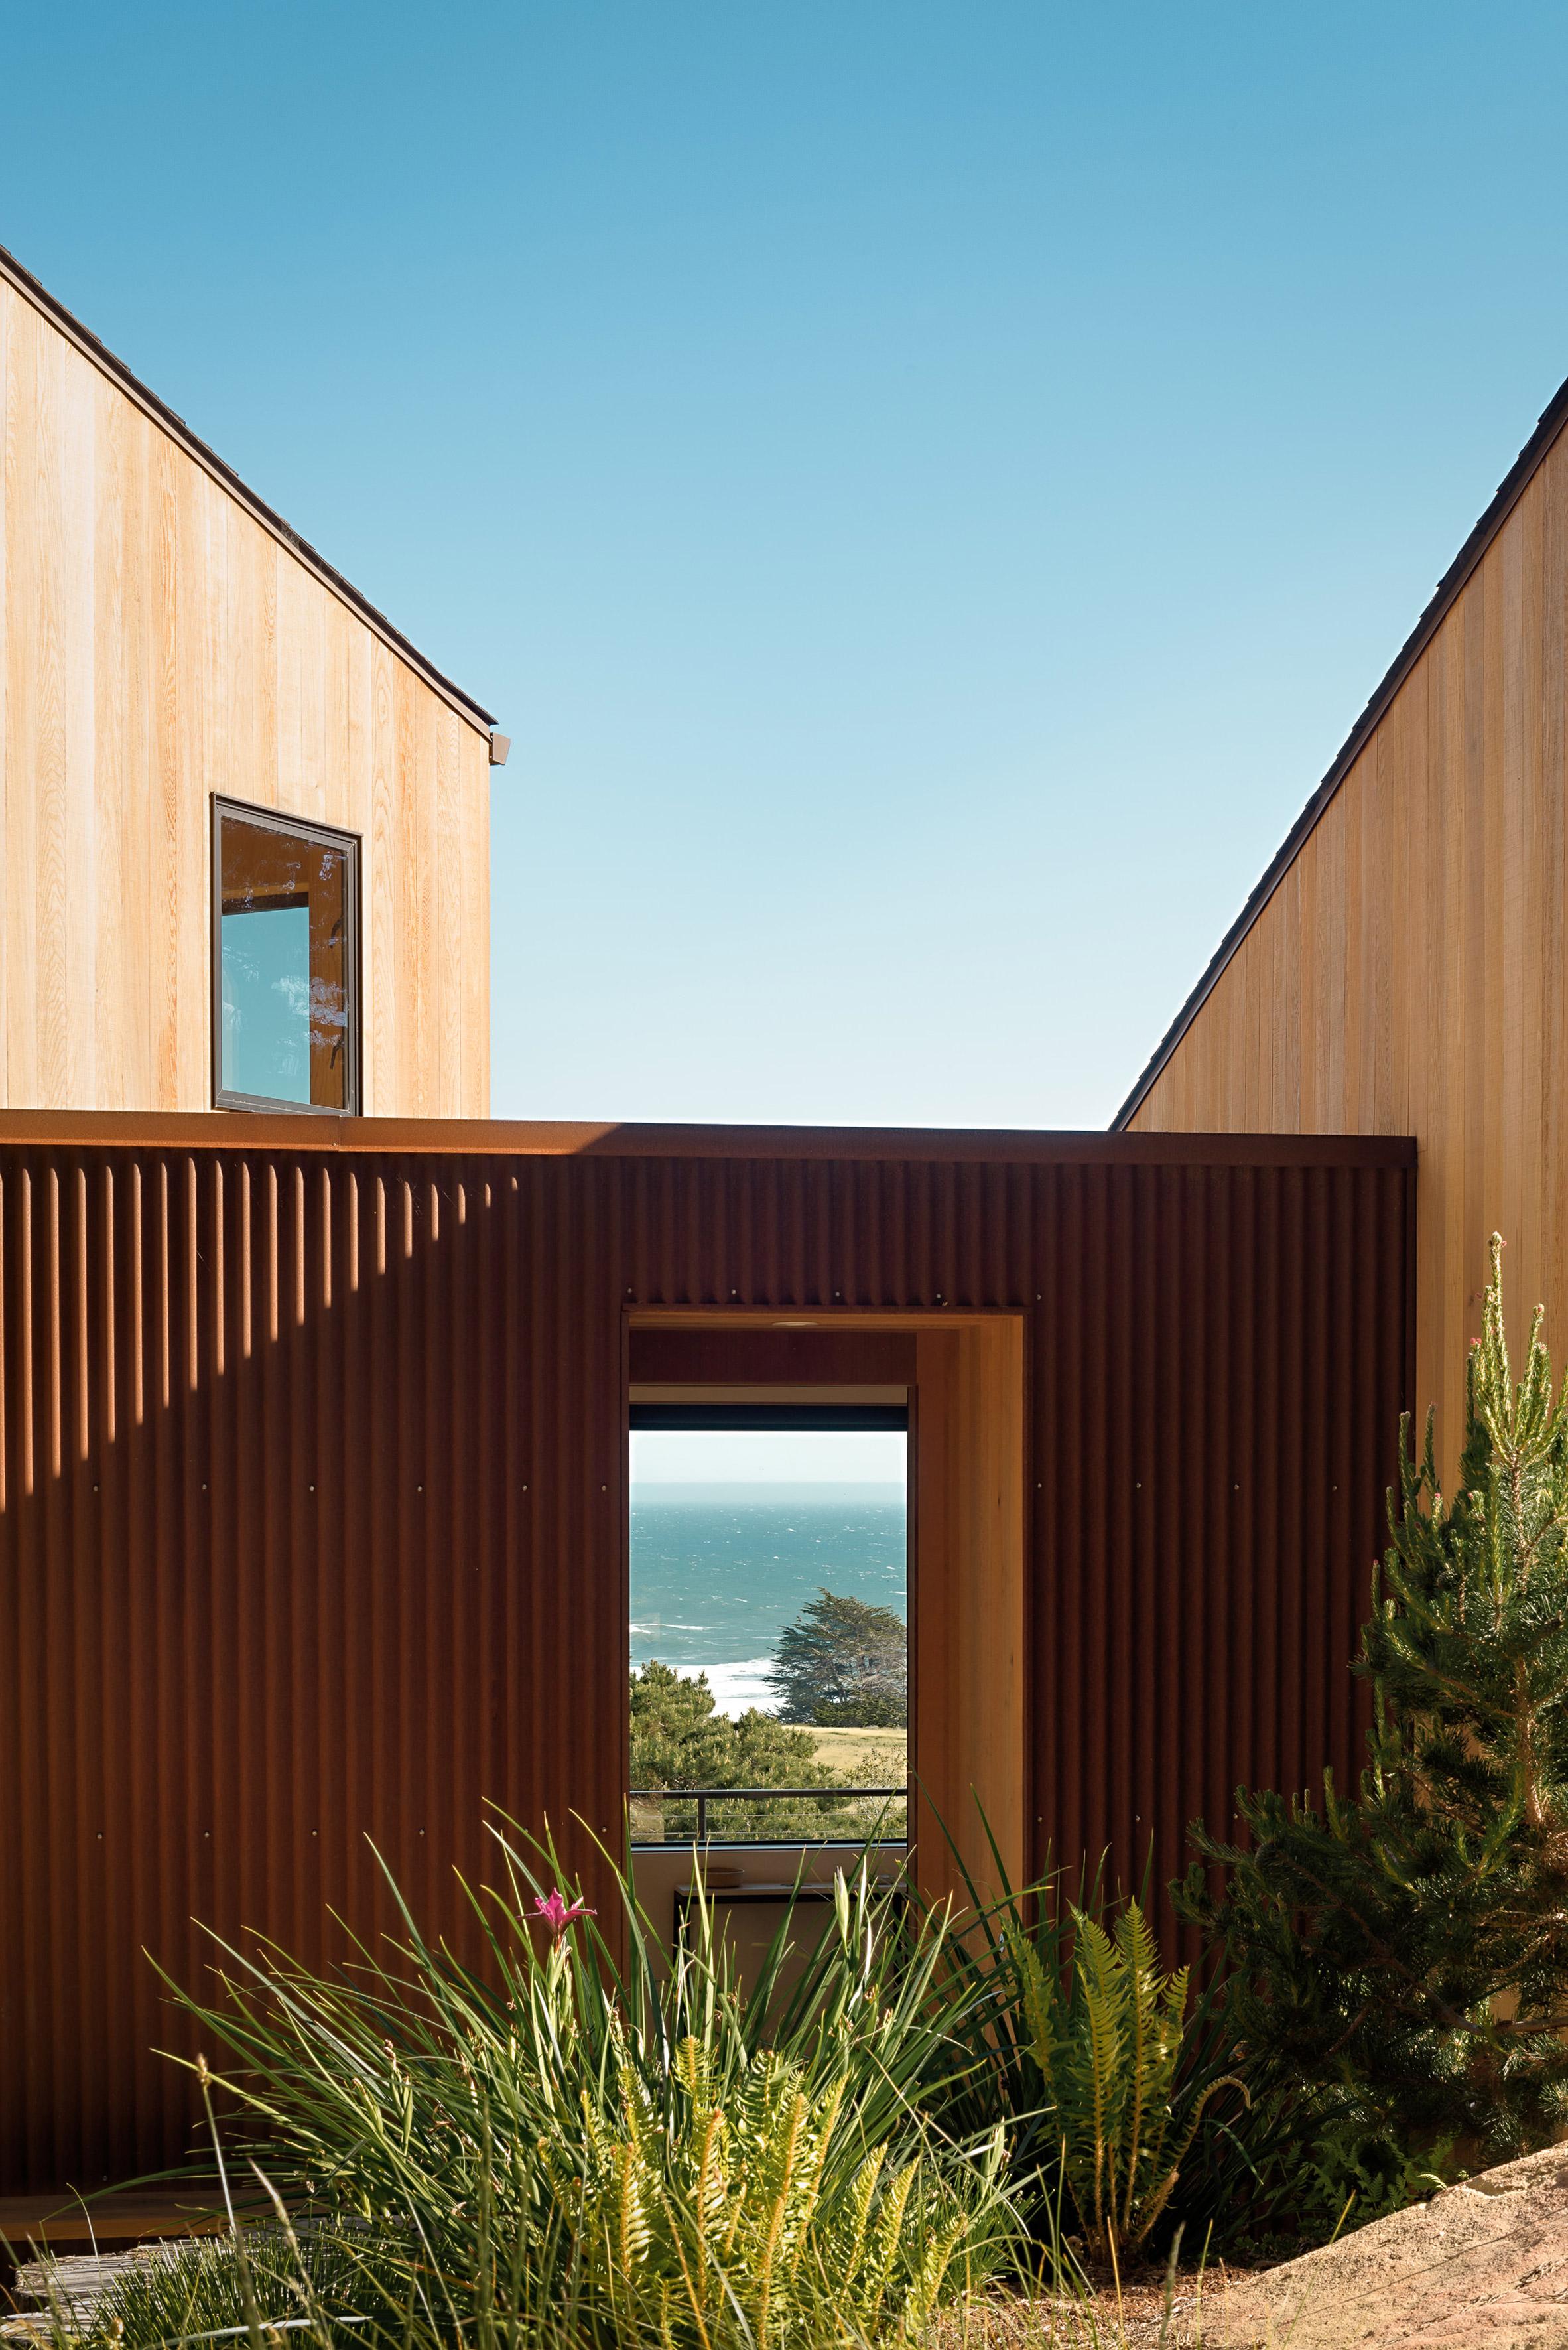 nhà bên biển coastal-retreat-malcolm-davis-architecture-sea-ranch-sonoma-county-califorinia-relaxing-space-elledecoration vn 4